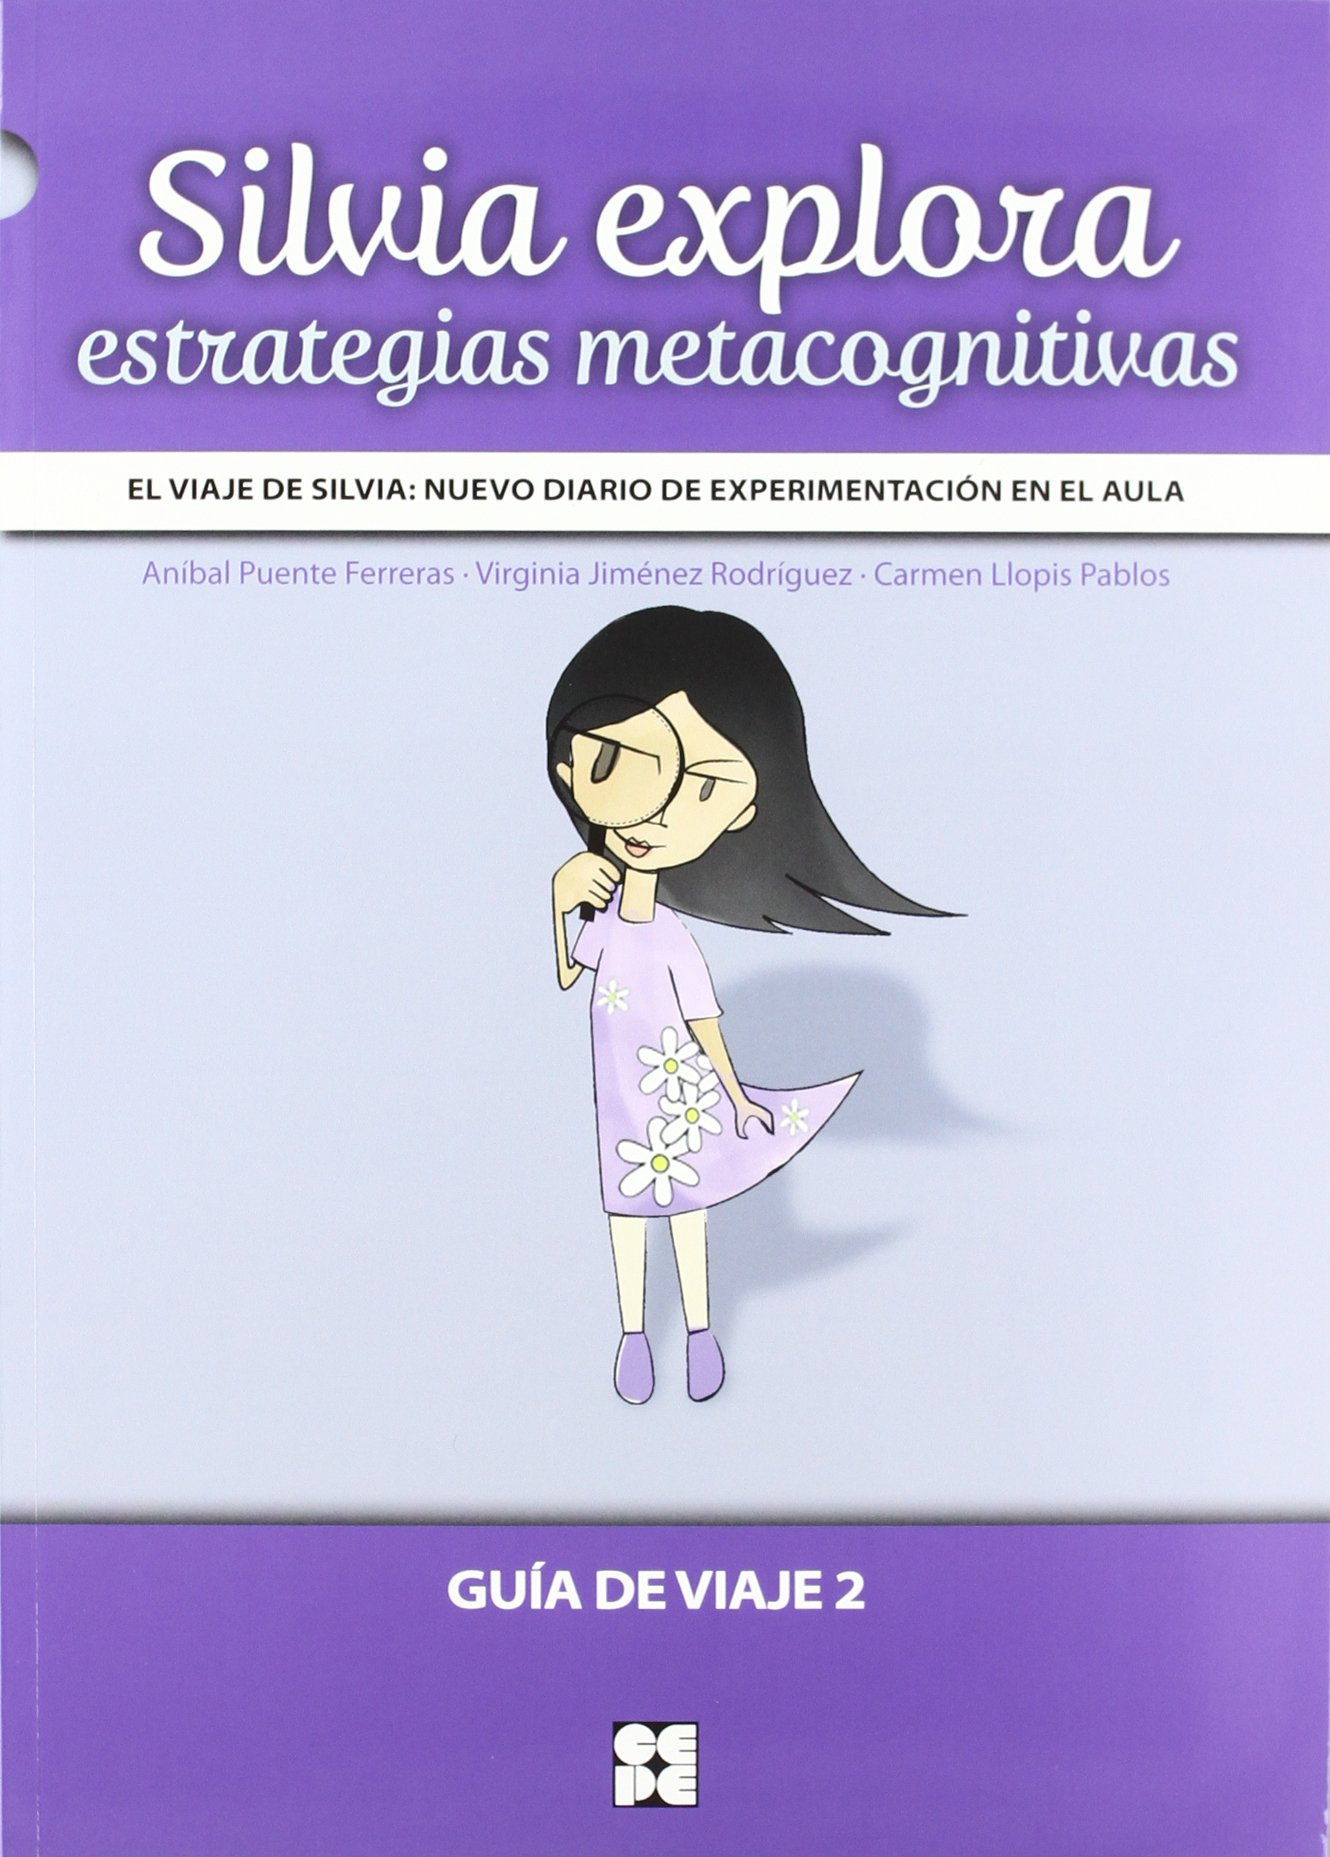 Silvia explora estrategias metacognitivas Fichas Infantil Y Primaria - 9788478698295: Amazon.es: Anibal Puente, Virginia Jimenez, Carmen Llopis: Libros